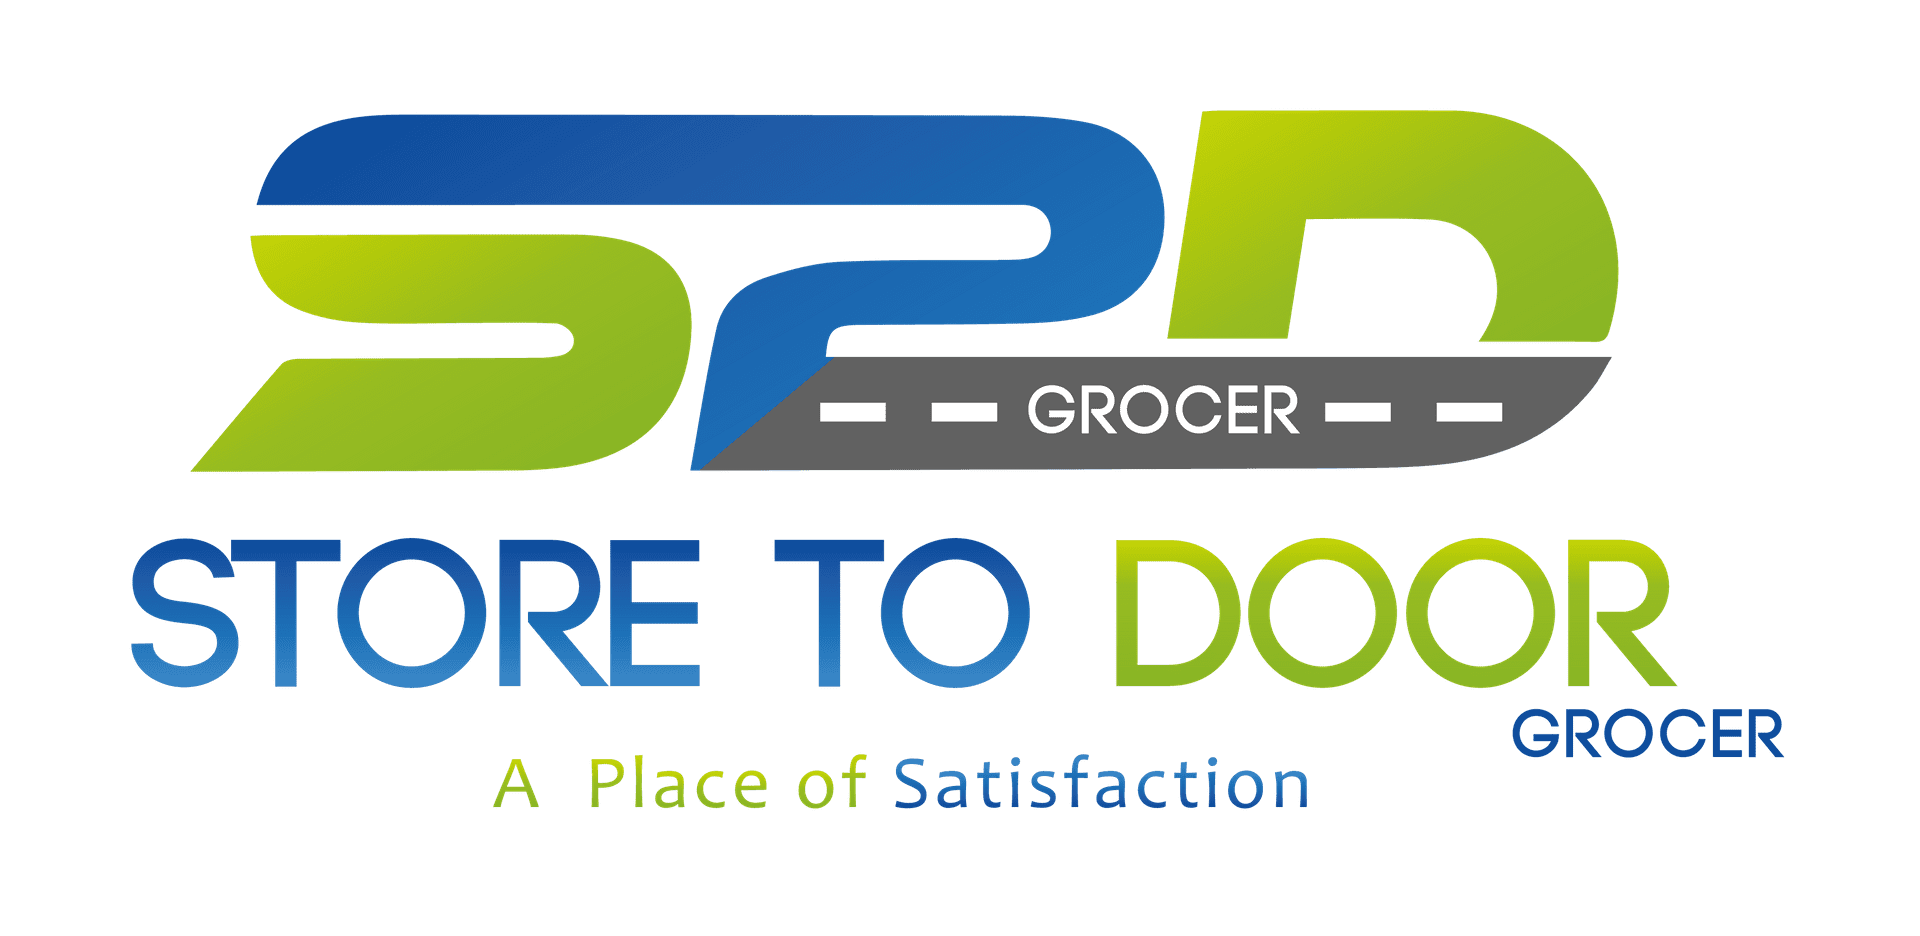 Storetodoorgrocer logo